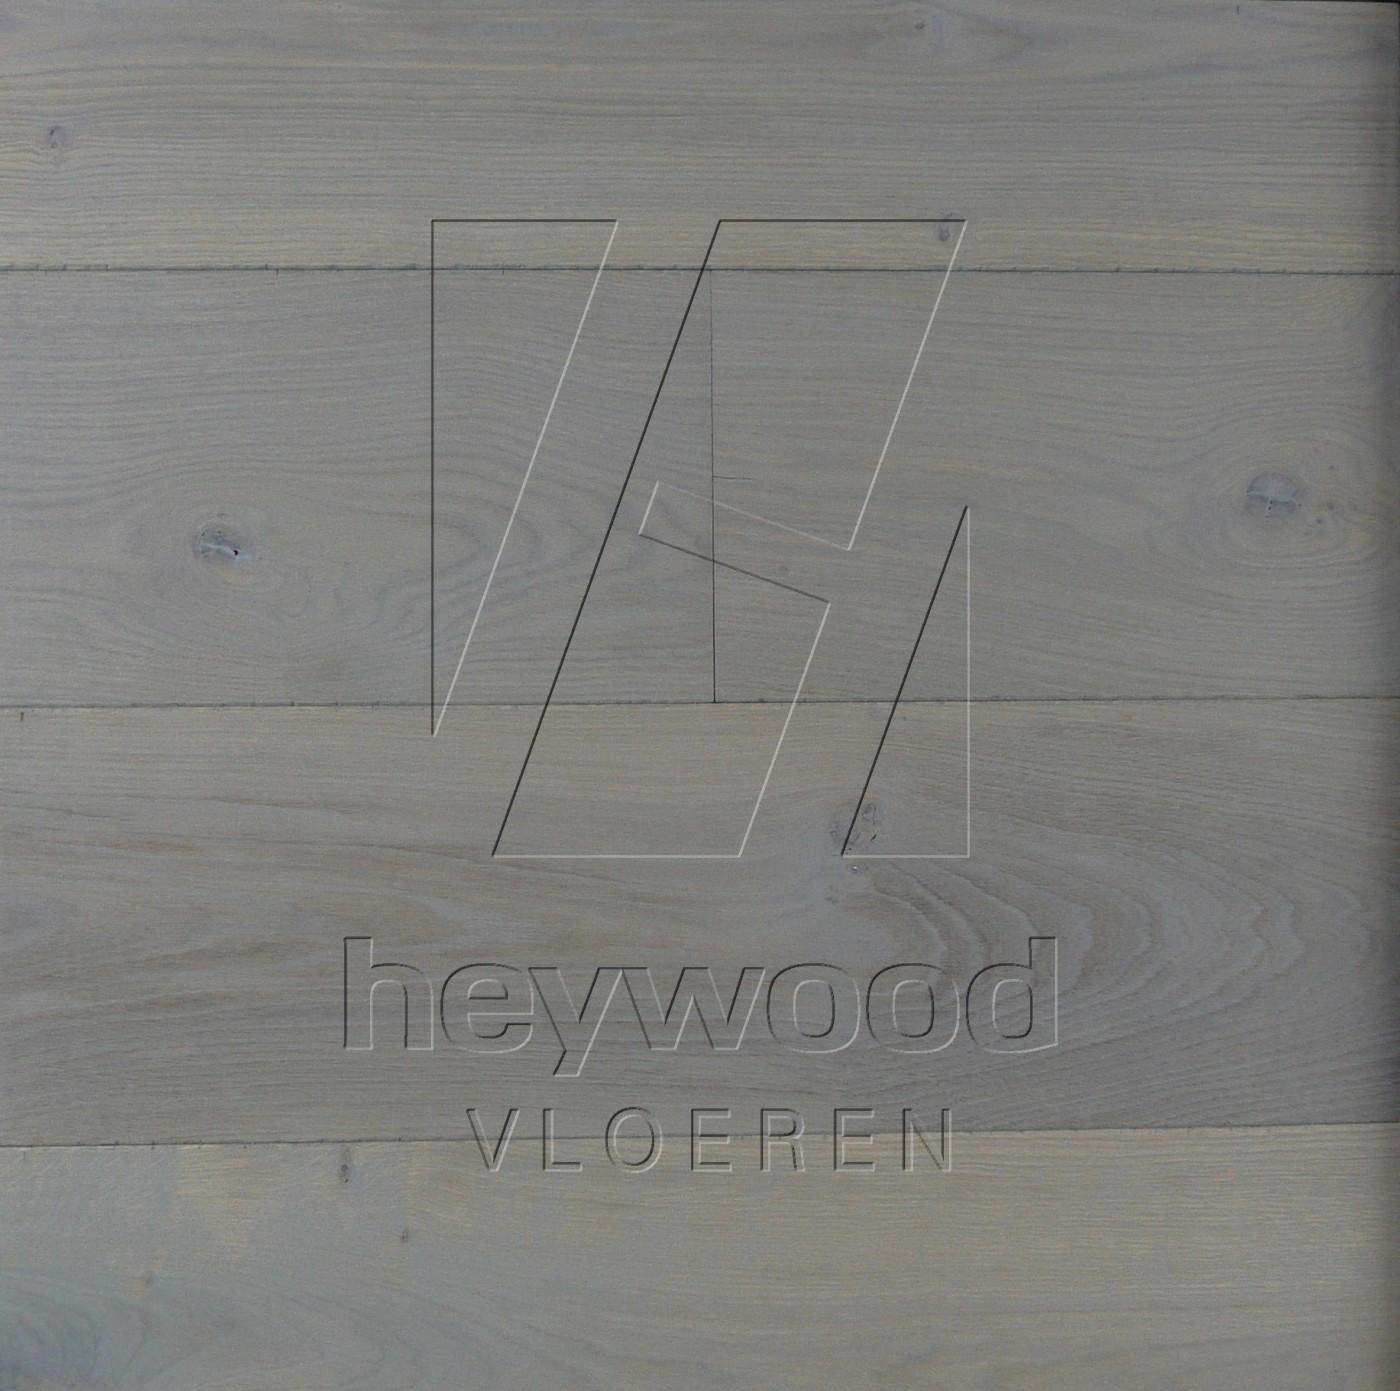 New Quay in European Oak Character of Bespoke Wooden Floors